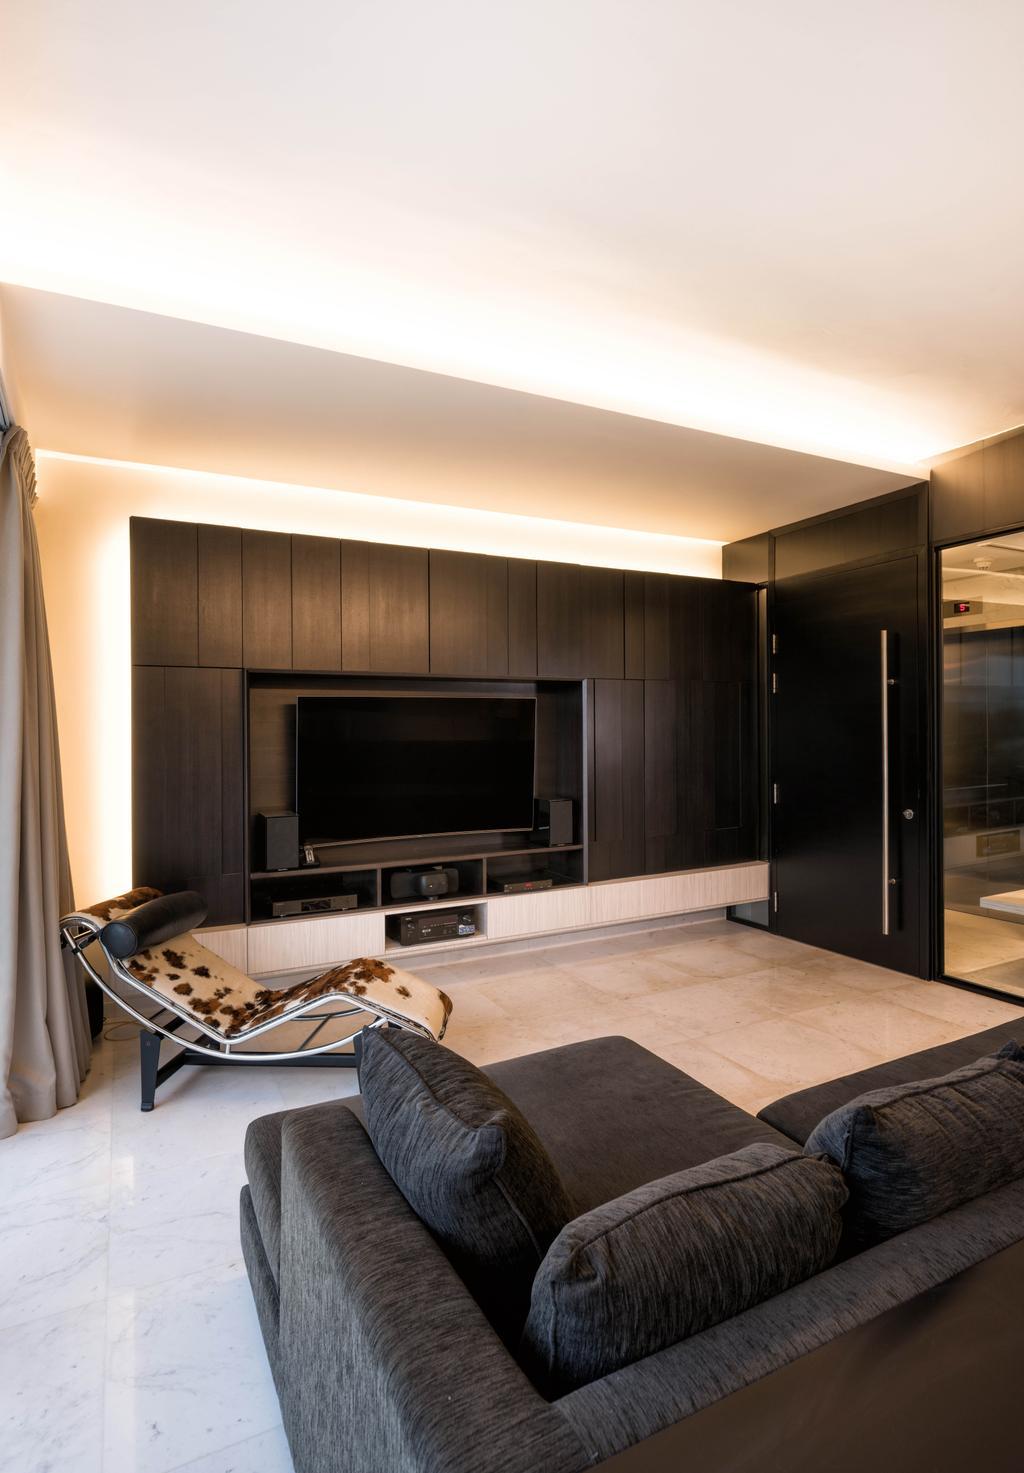 Modern, Condo, Living Room, Meyer Road, Architect, LLARK Architects, Electronics, Entertainment Center, Fireplace, Hearth, Indoors, Interior Design